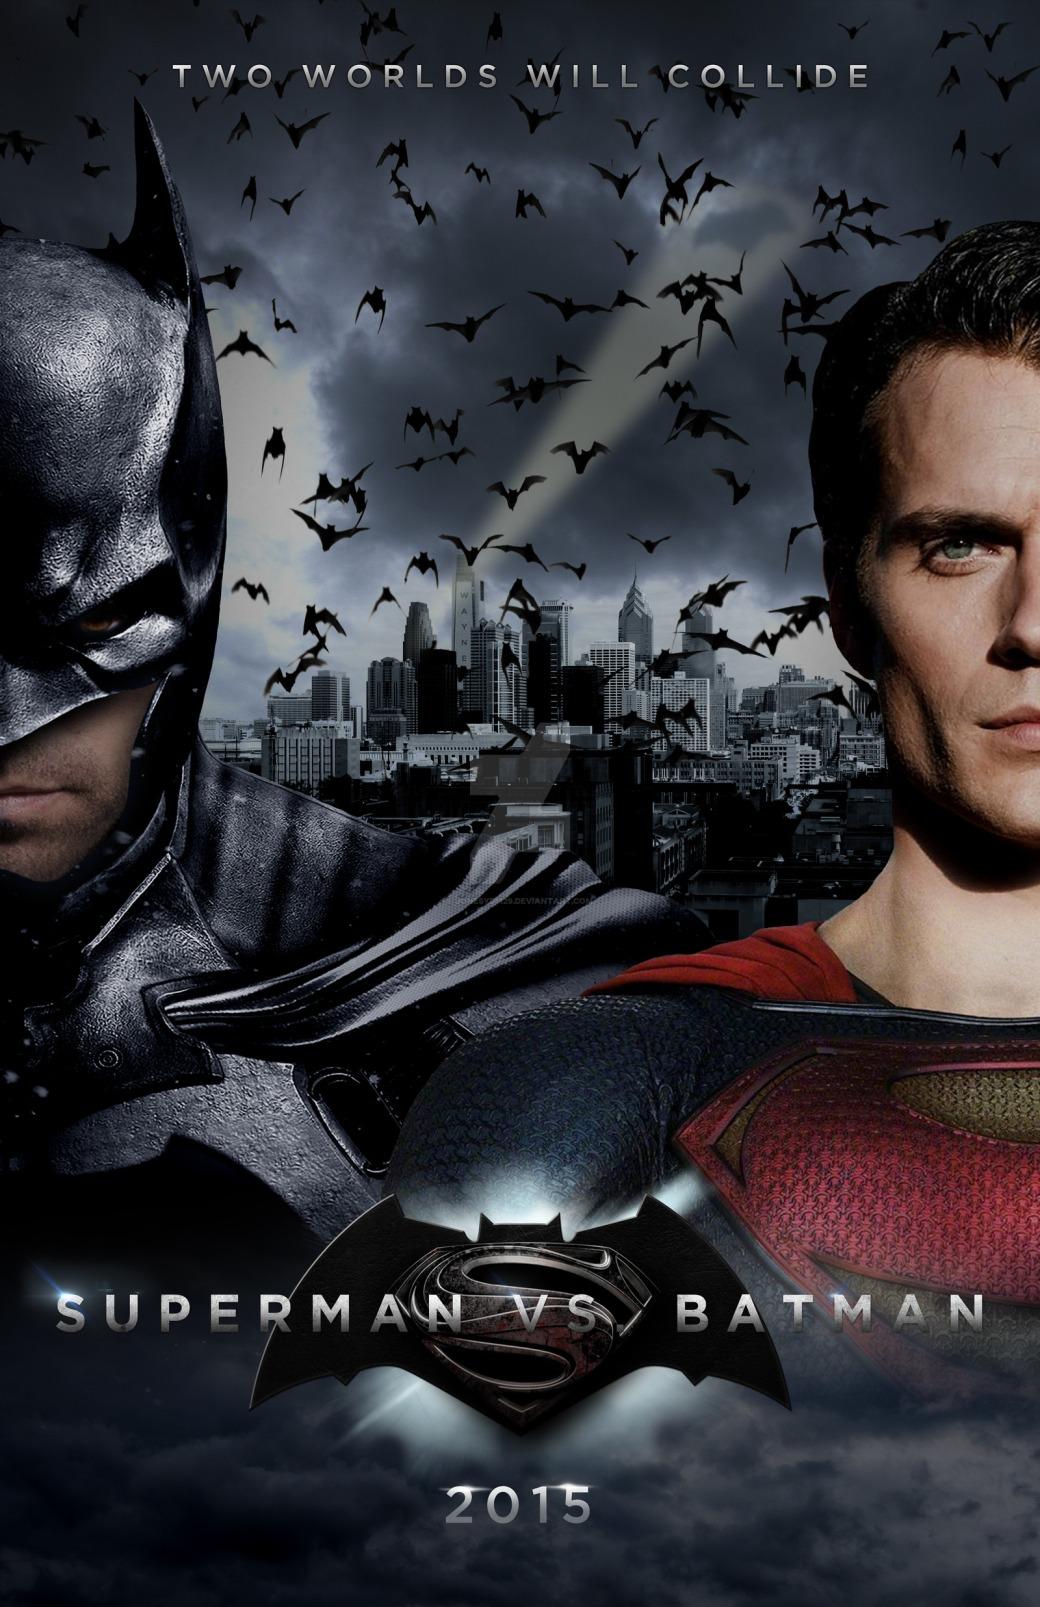 batman_v__superman__dawn_of_justice_poster_1_by_jonesyd1129-d6op4bv